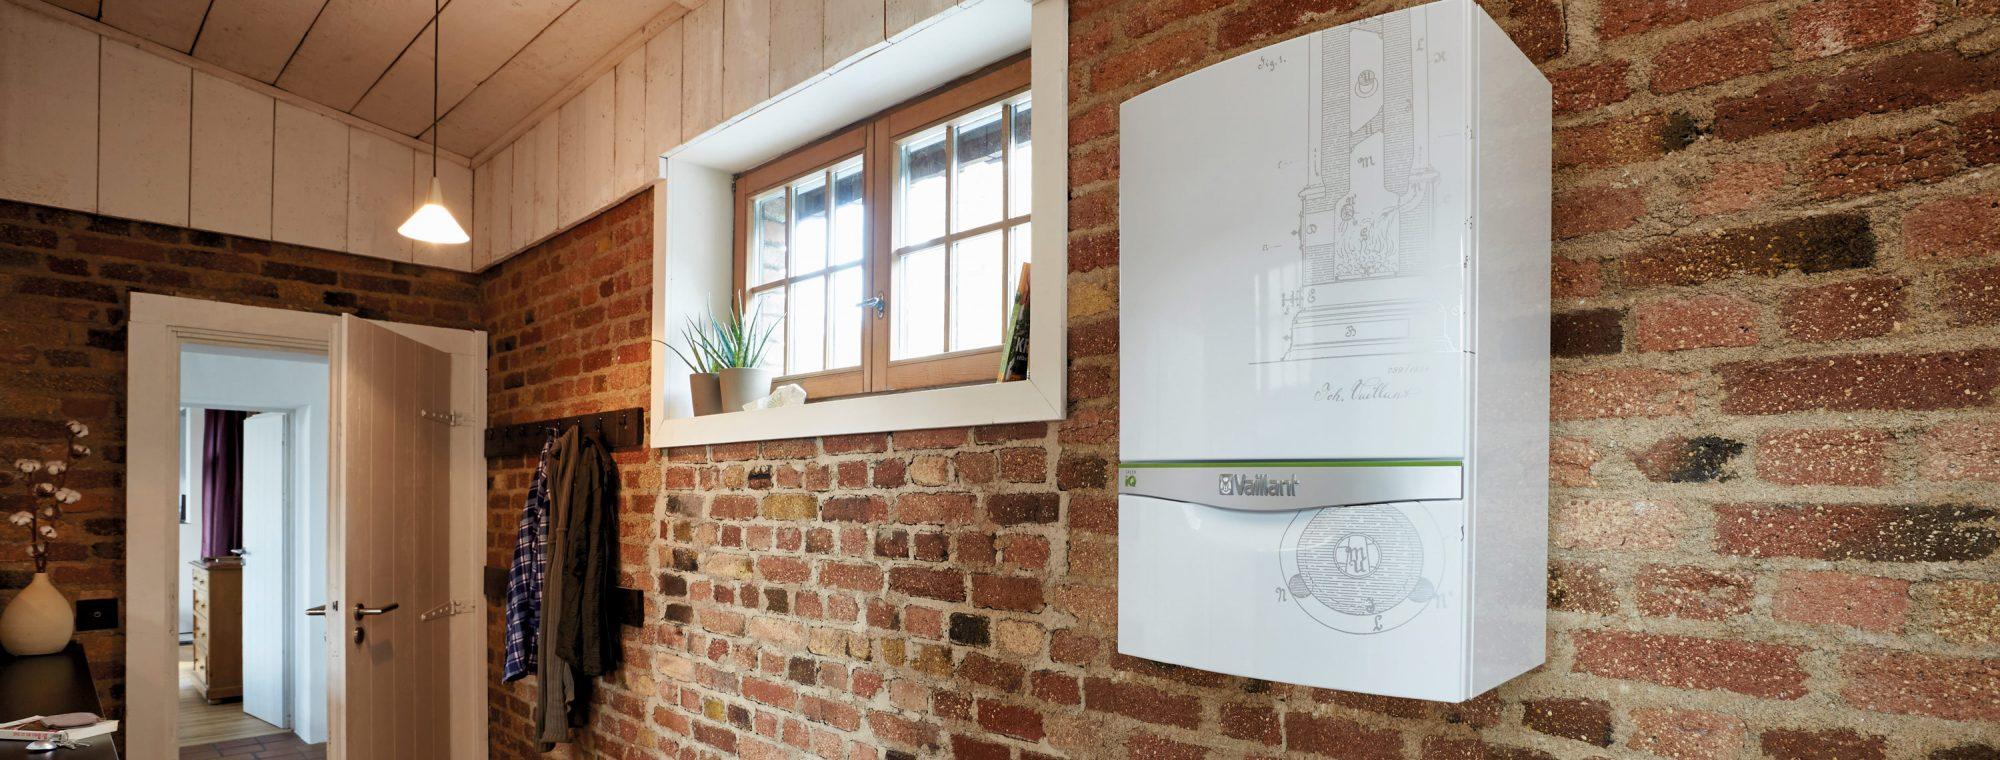 Vaillant Green iQ ERP Boiler